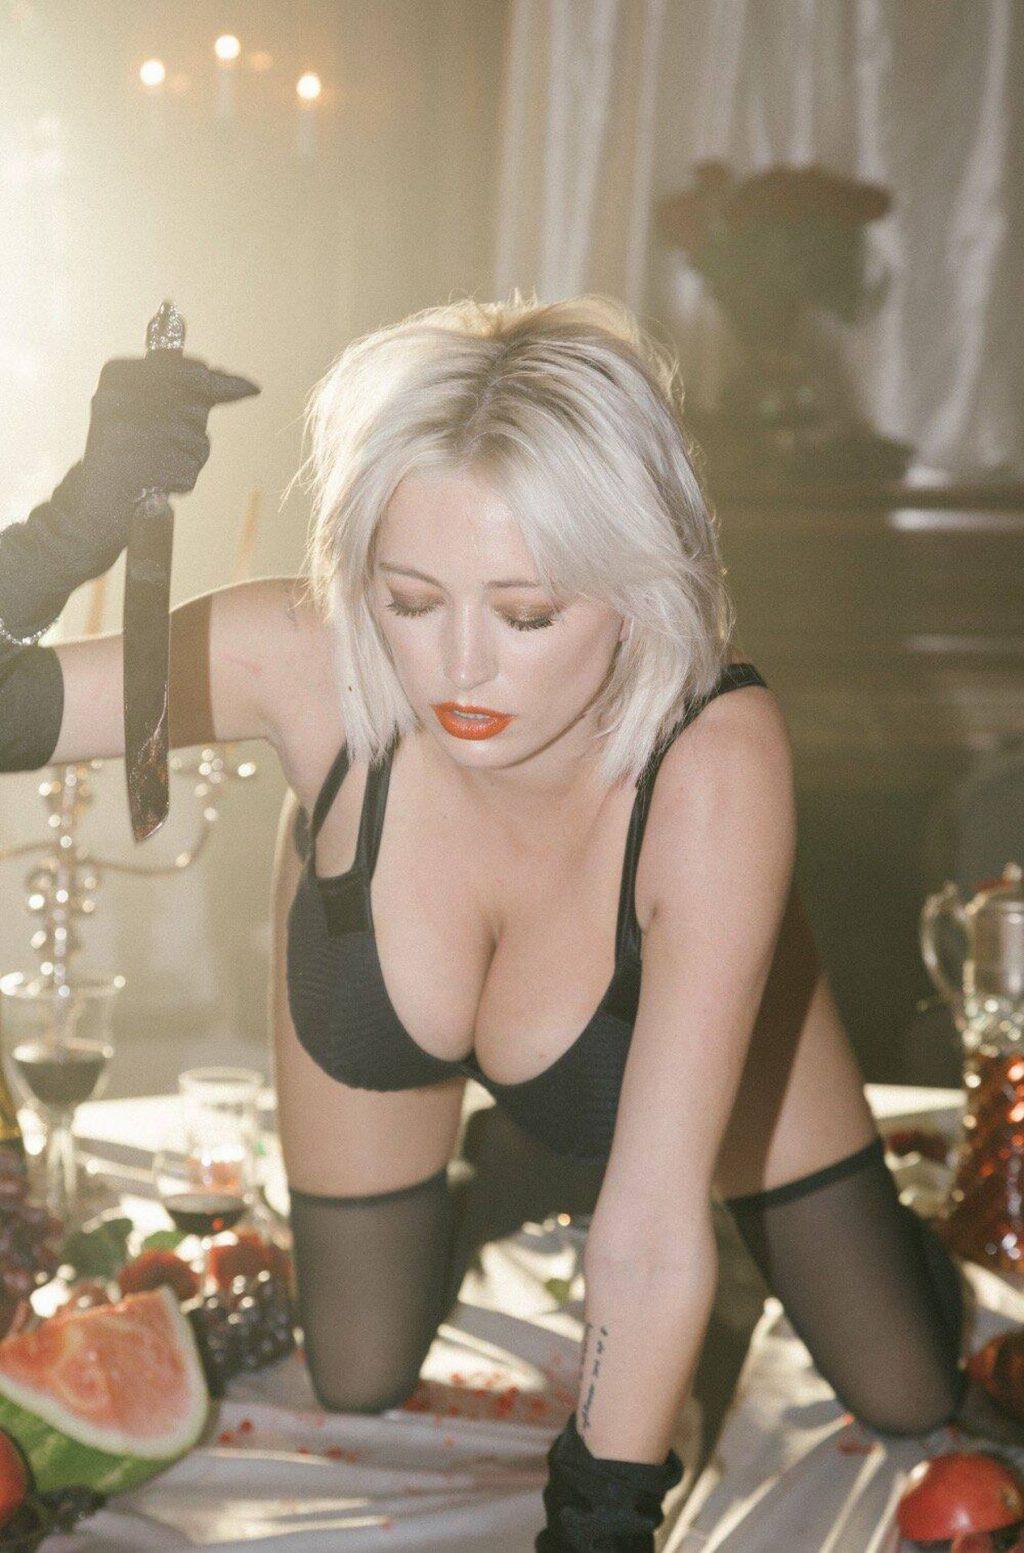 Caroline Vreeland Shows Her Big Boobs for Flaunt Magazine (7 Photos)